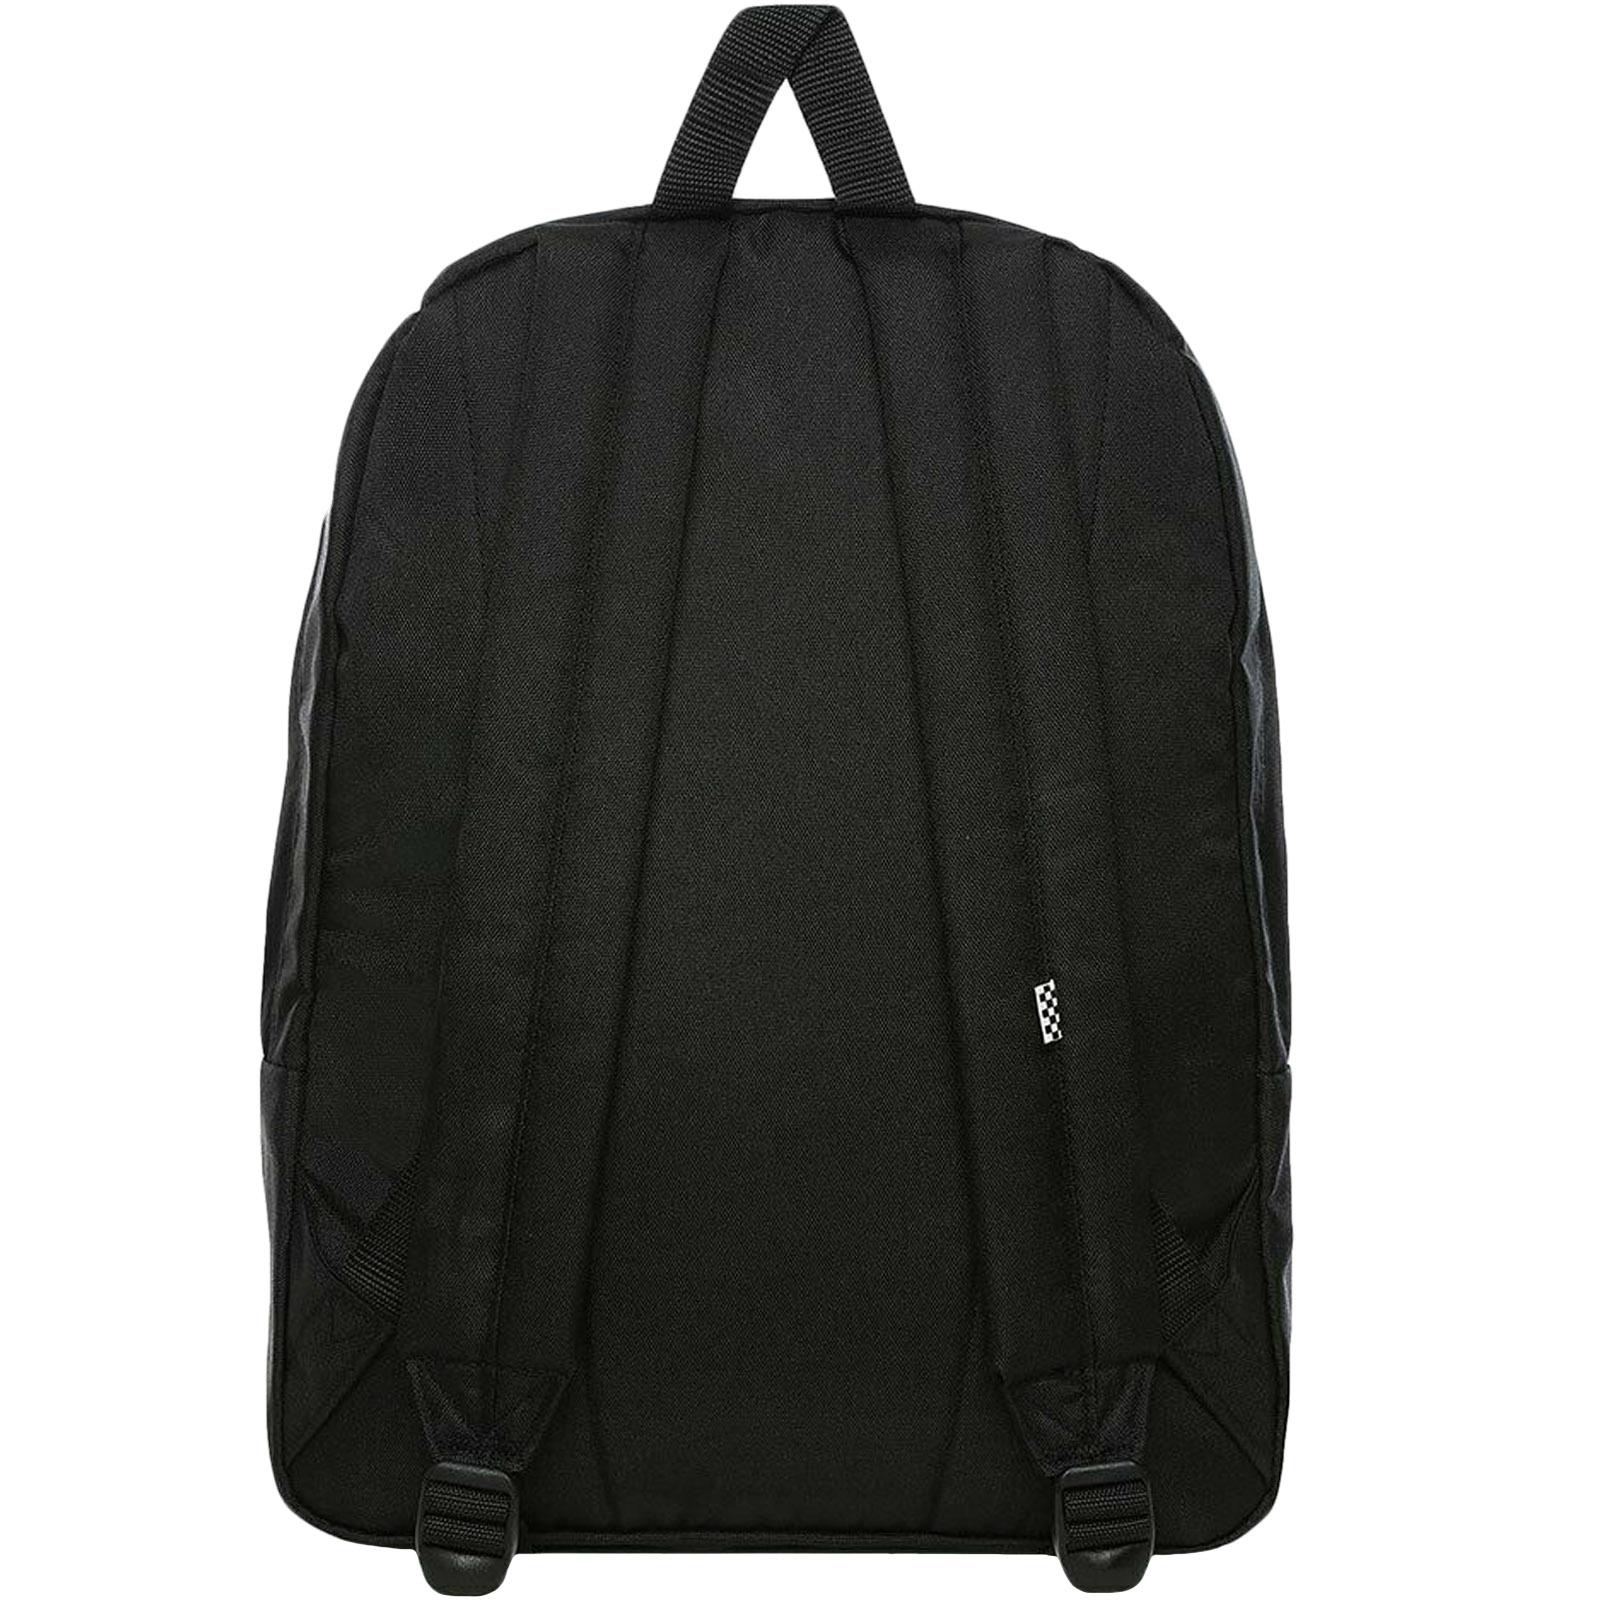 thumbnail 8 - Vans Unisex Two Strap Realm Adjustable School College Rucksack Backpack Bag